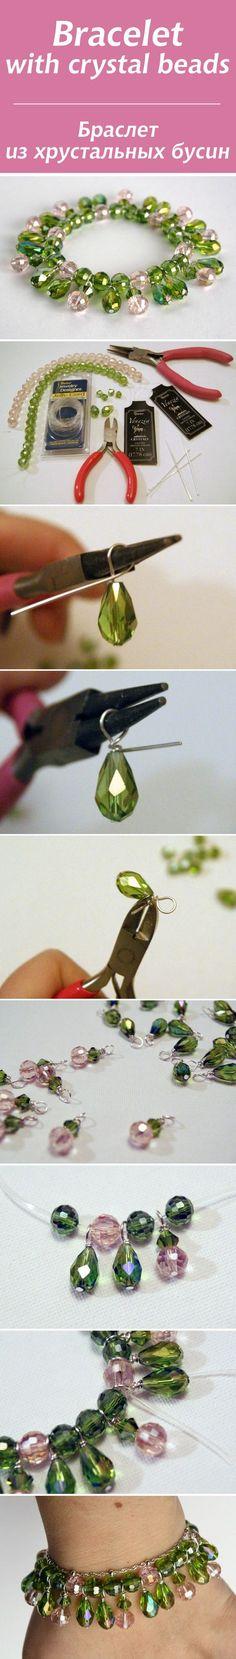 Браслет из хрустальных бусин / Bracelet with crystal beads tutorial